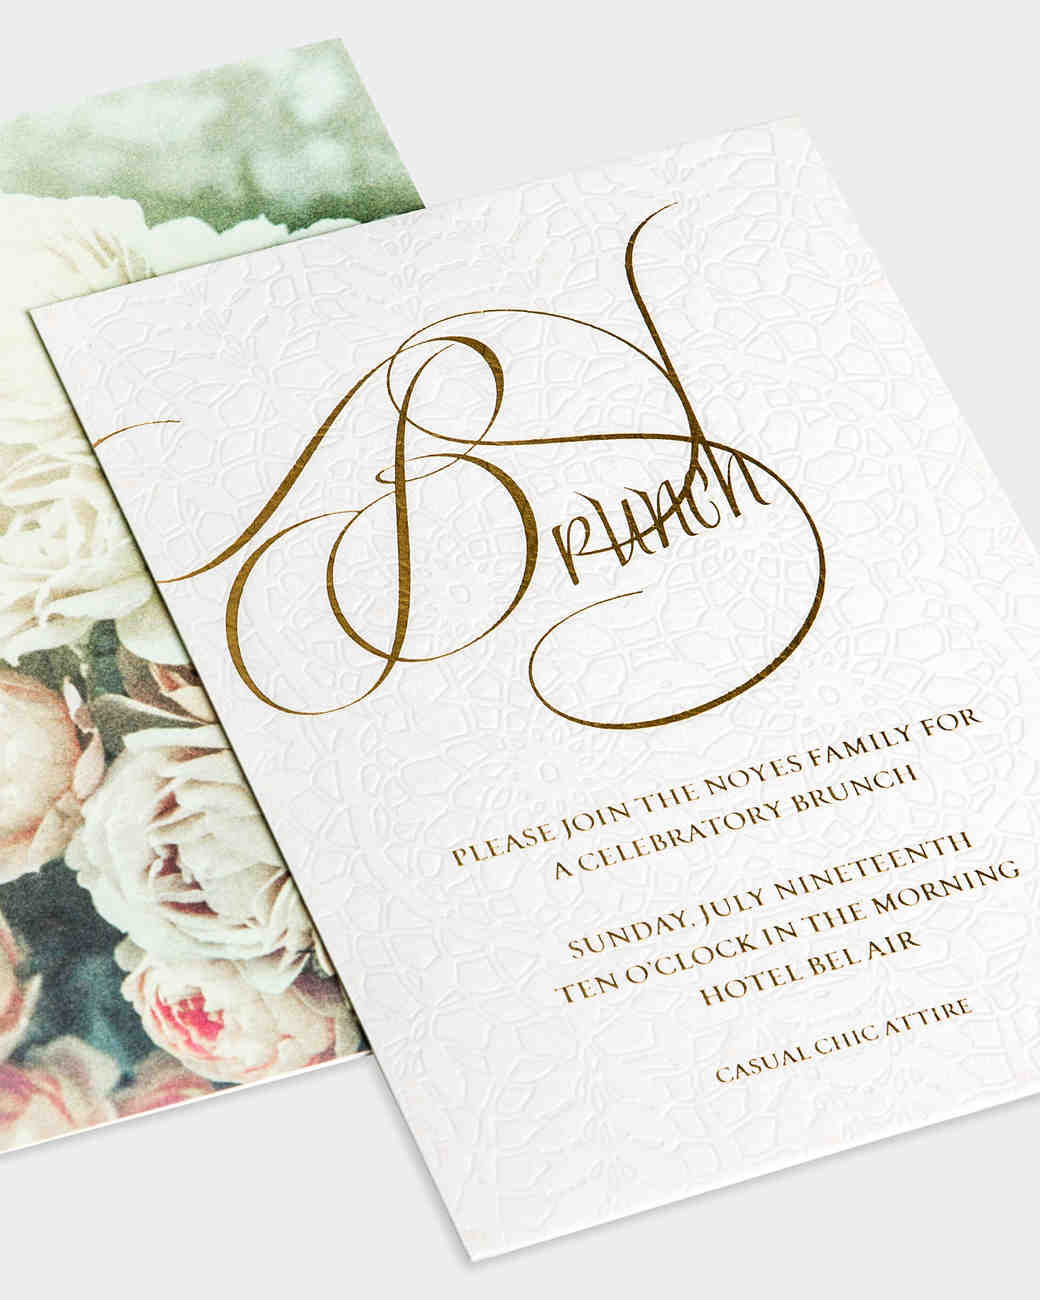 After Wedding Brunch Ideas: Fresh Ideas For Your Wedding Weekend